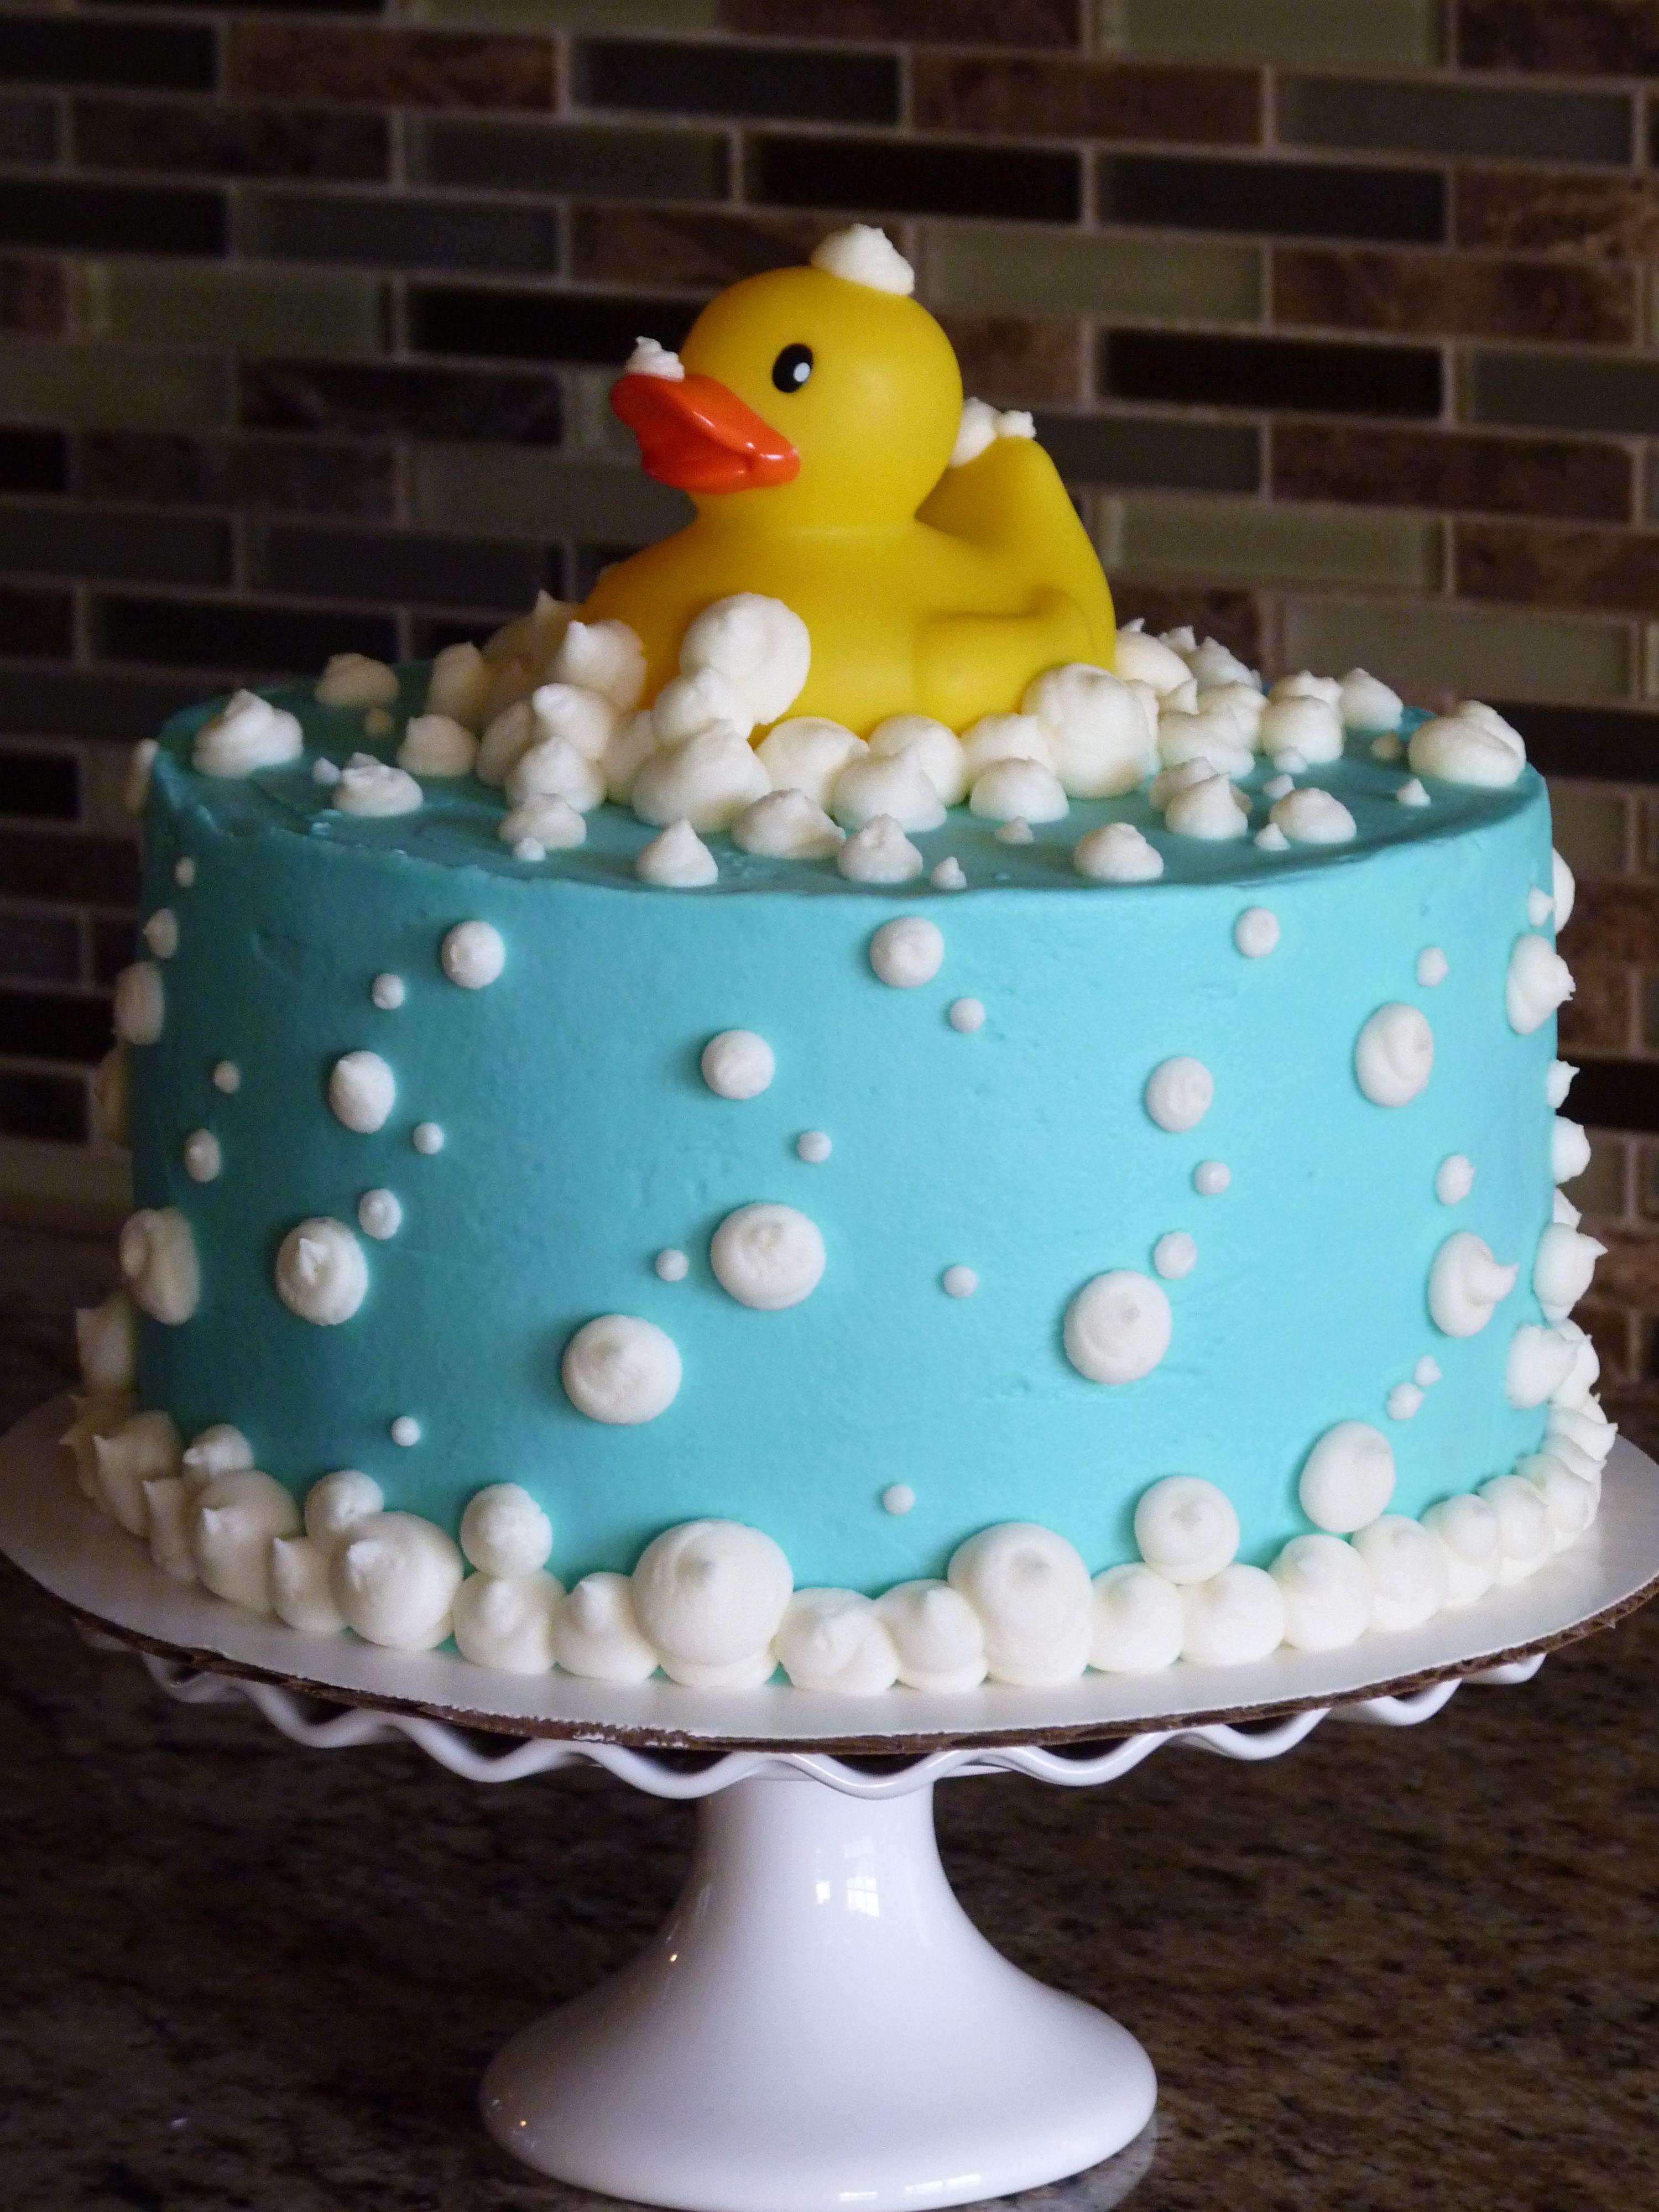 Fabulous Rubber Ducky Cake Mimissweetcakesnbakes Rubberduckycake Funny Birthday Cards Online Elaedamsfinfo